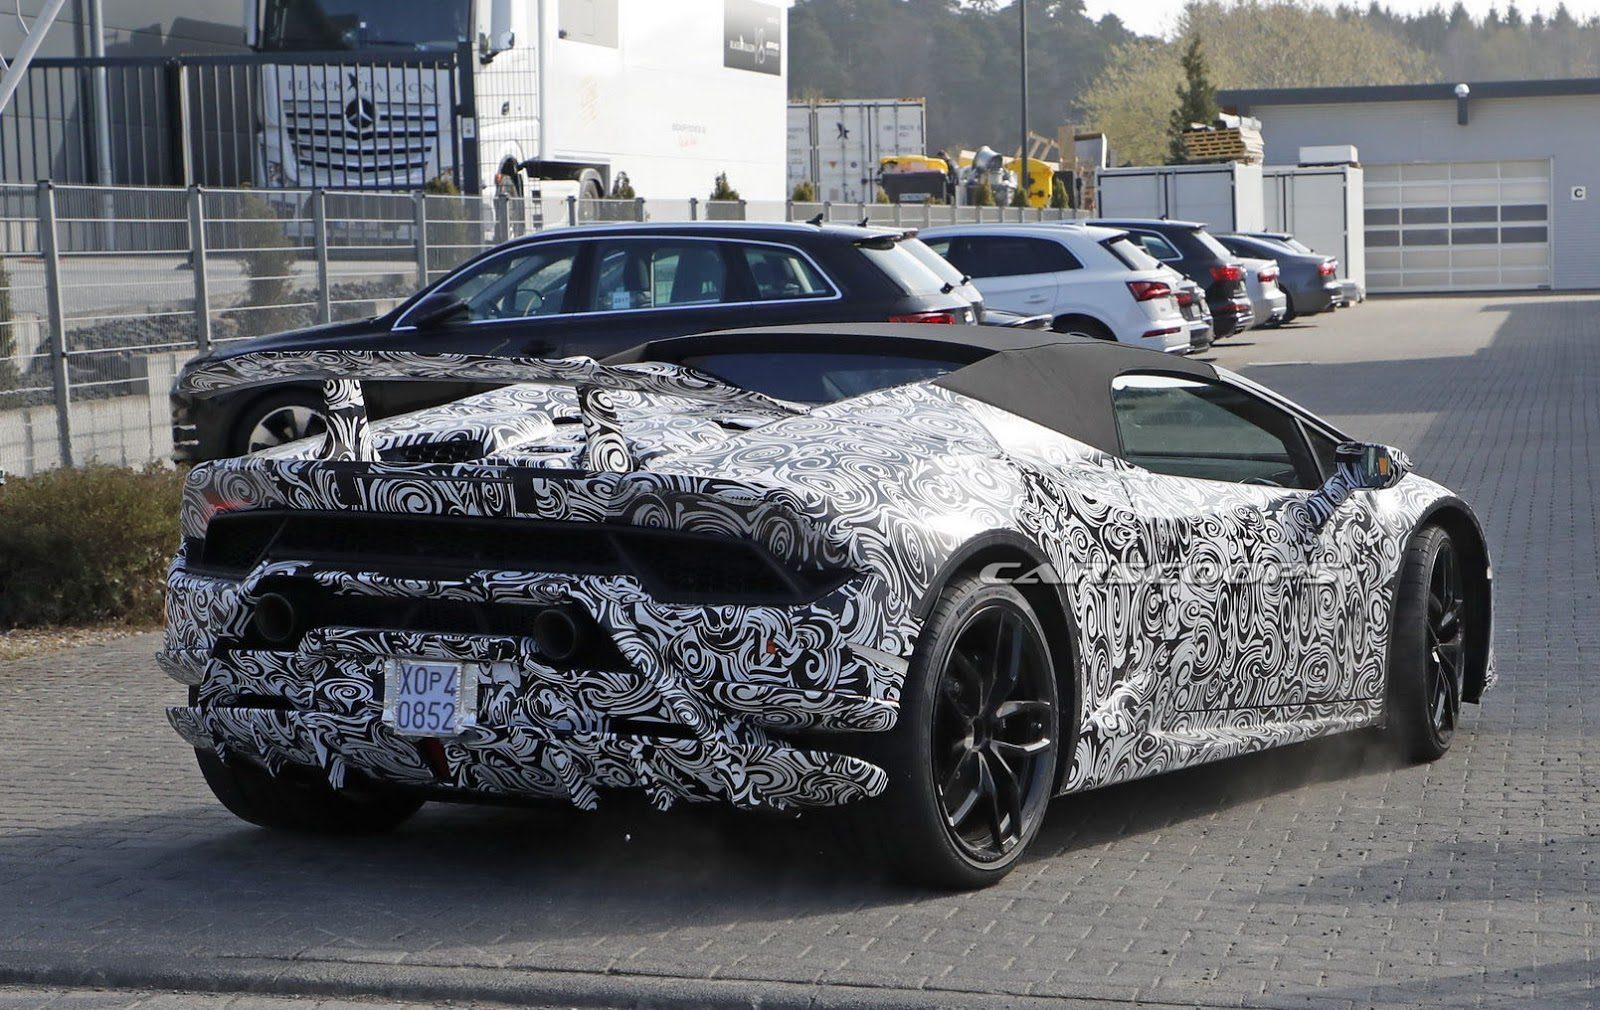 Lamborghini-Huracan-Performante-Spyder-9